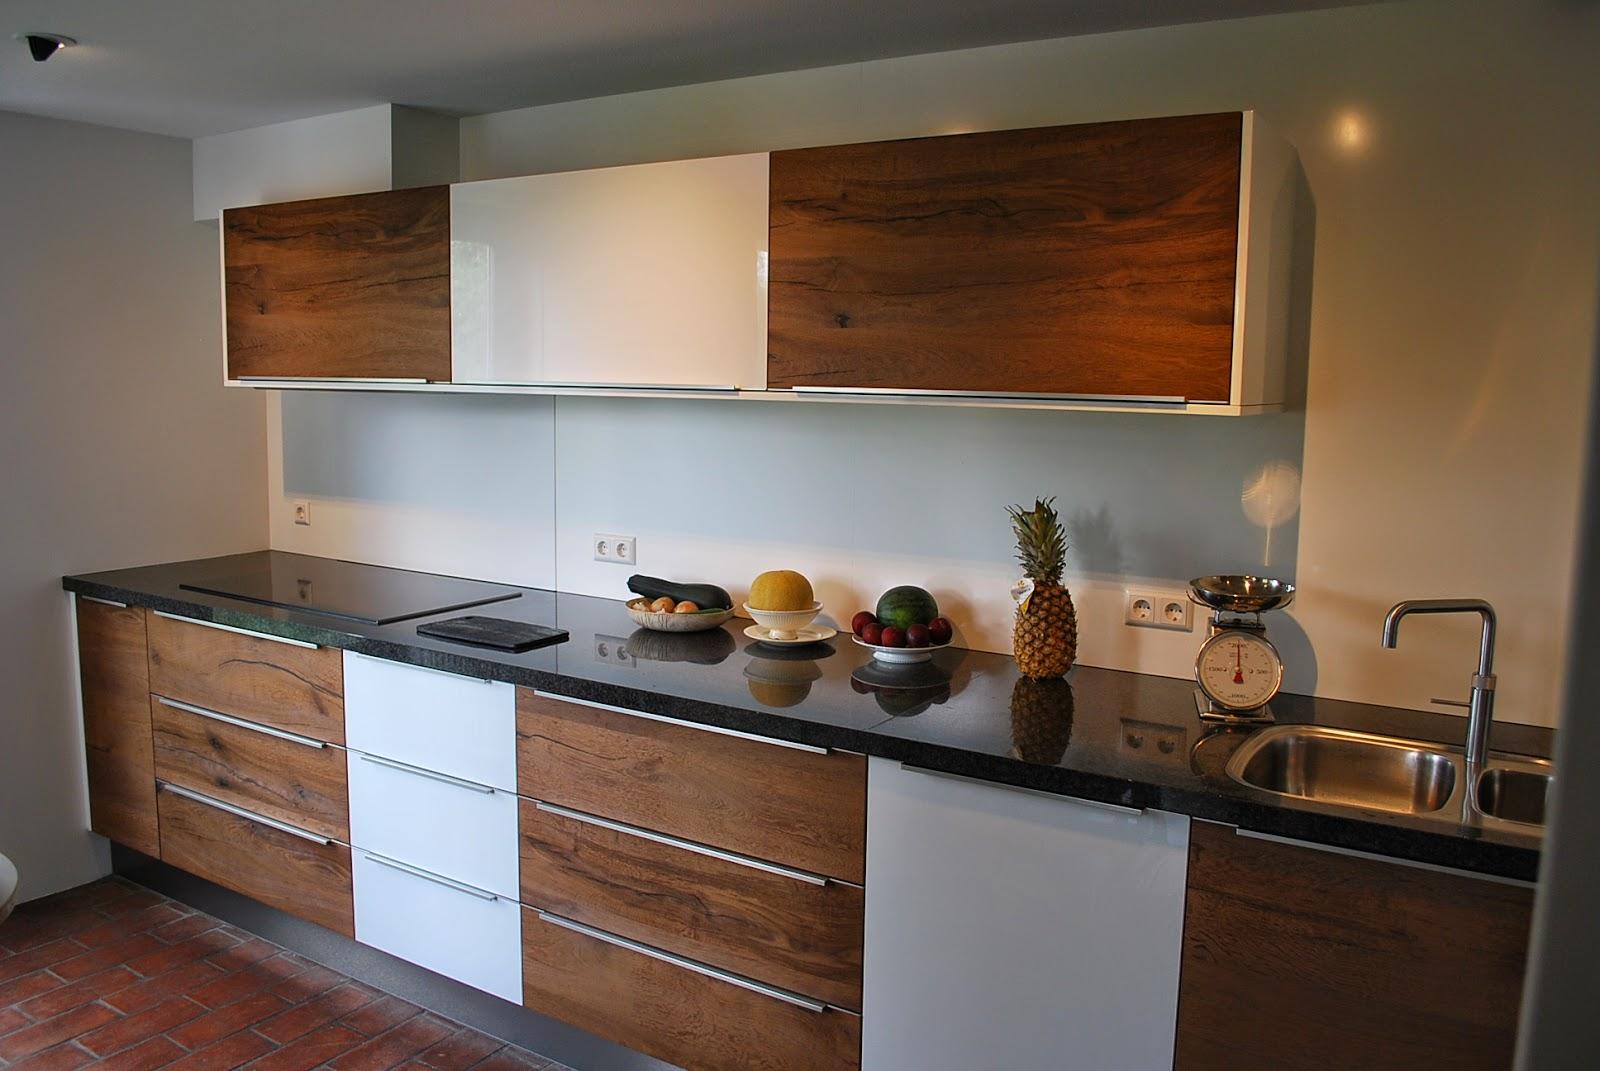 Keuken Hoogglans Wit Achterwand – Atumre com